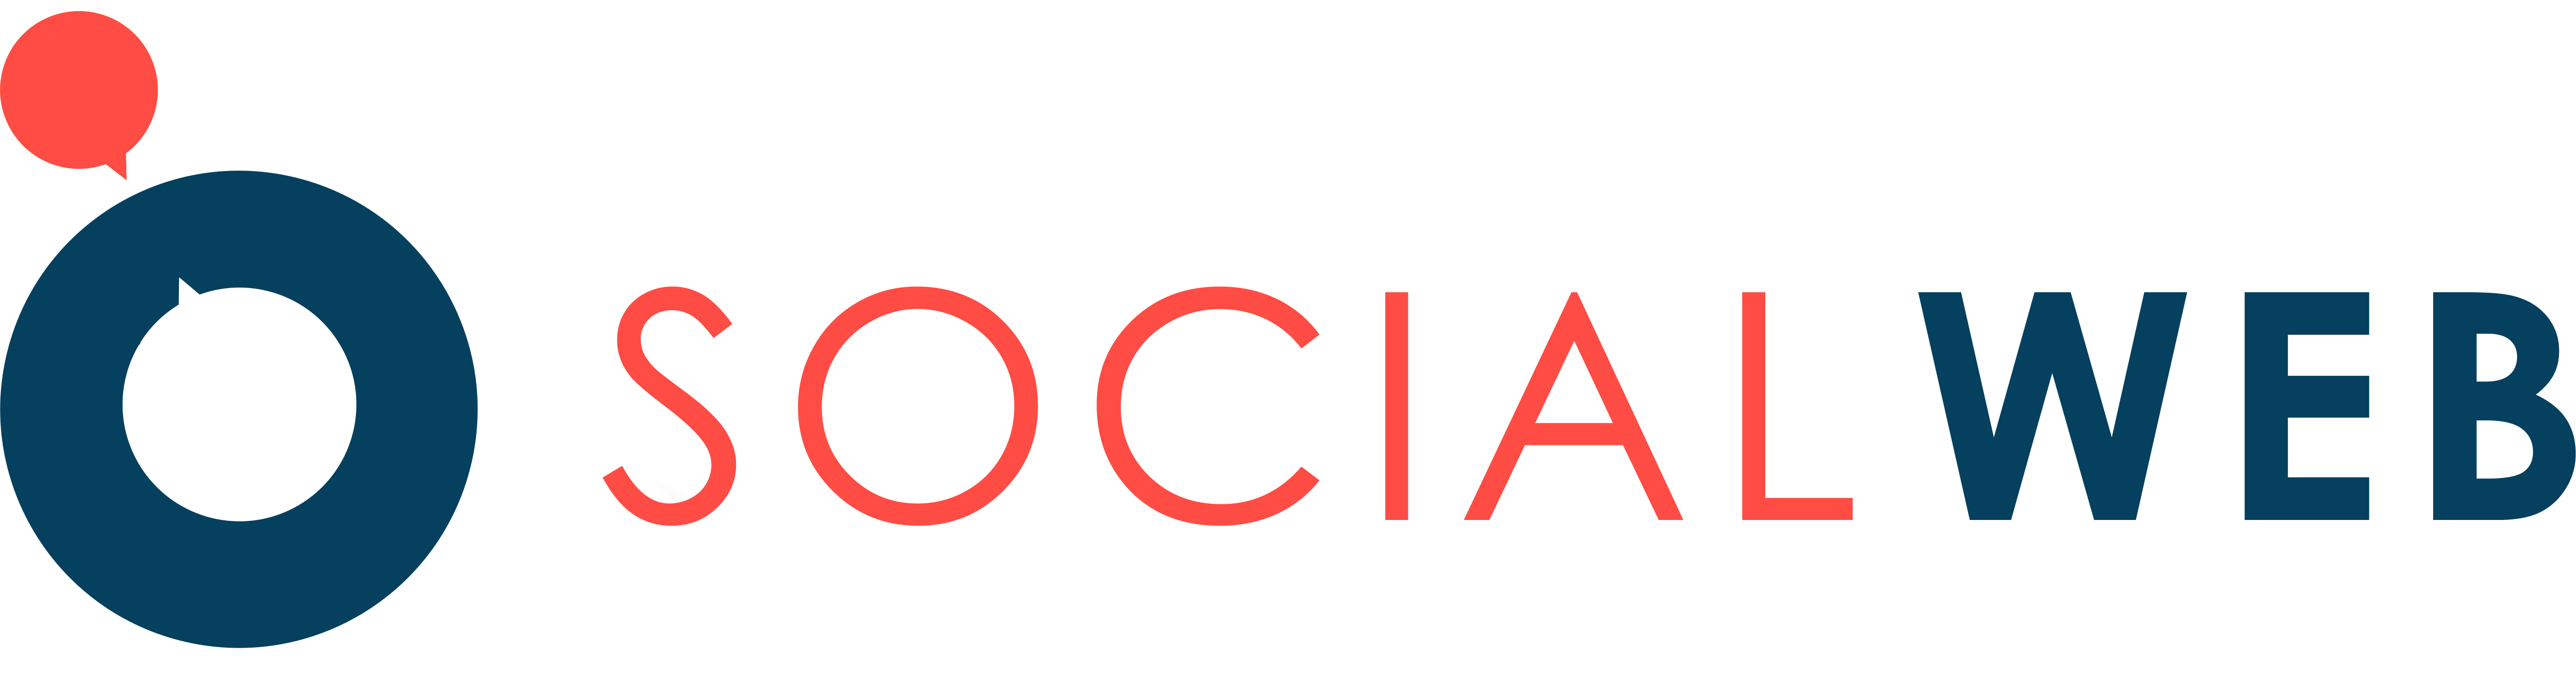 social wall WEB